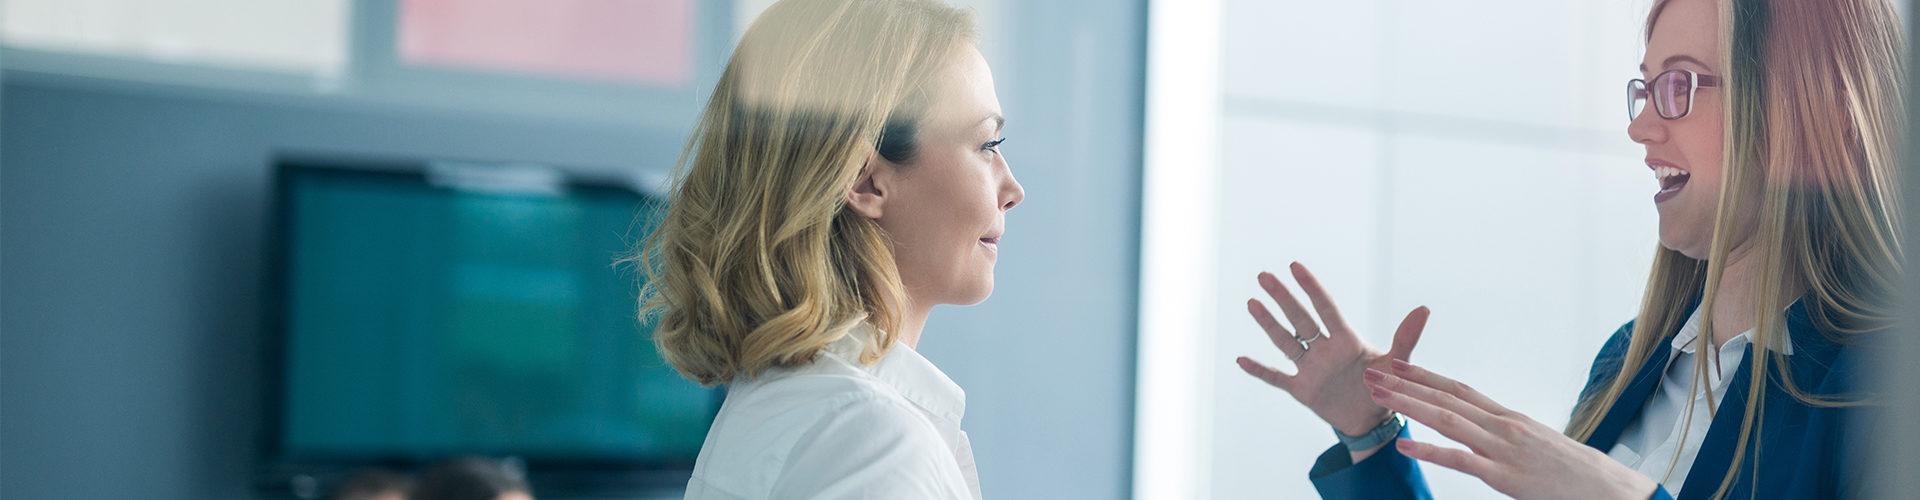 Managing a Successful Multi-Language Implementation of SAP SuccessFactors Onboarding featured image